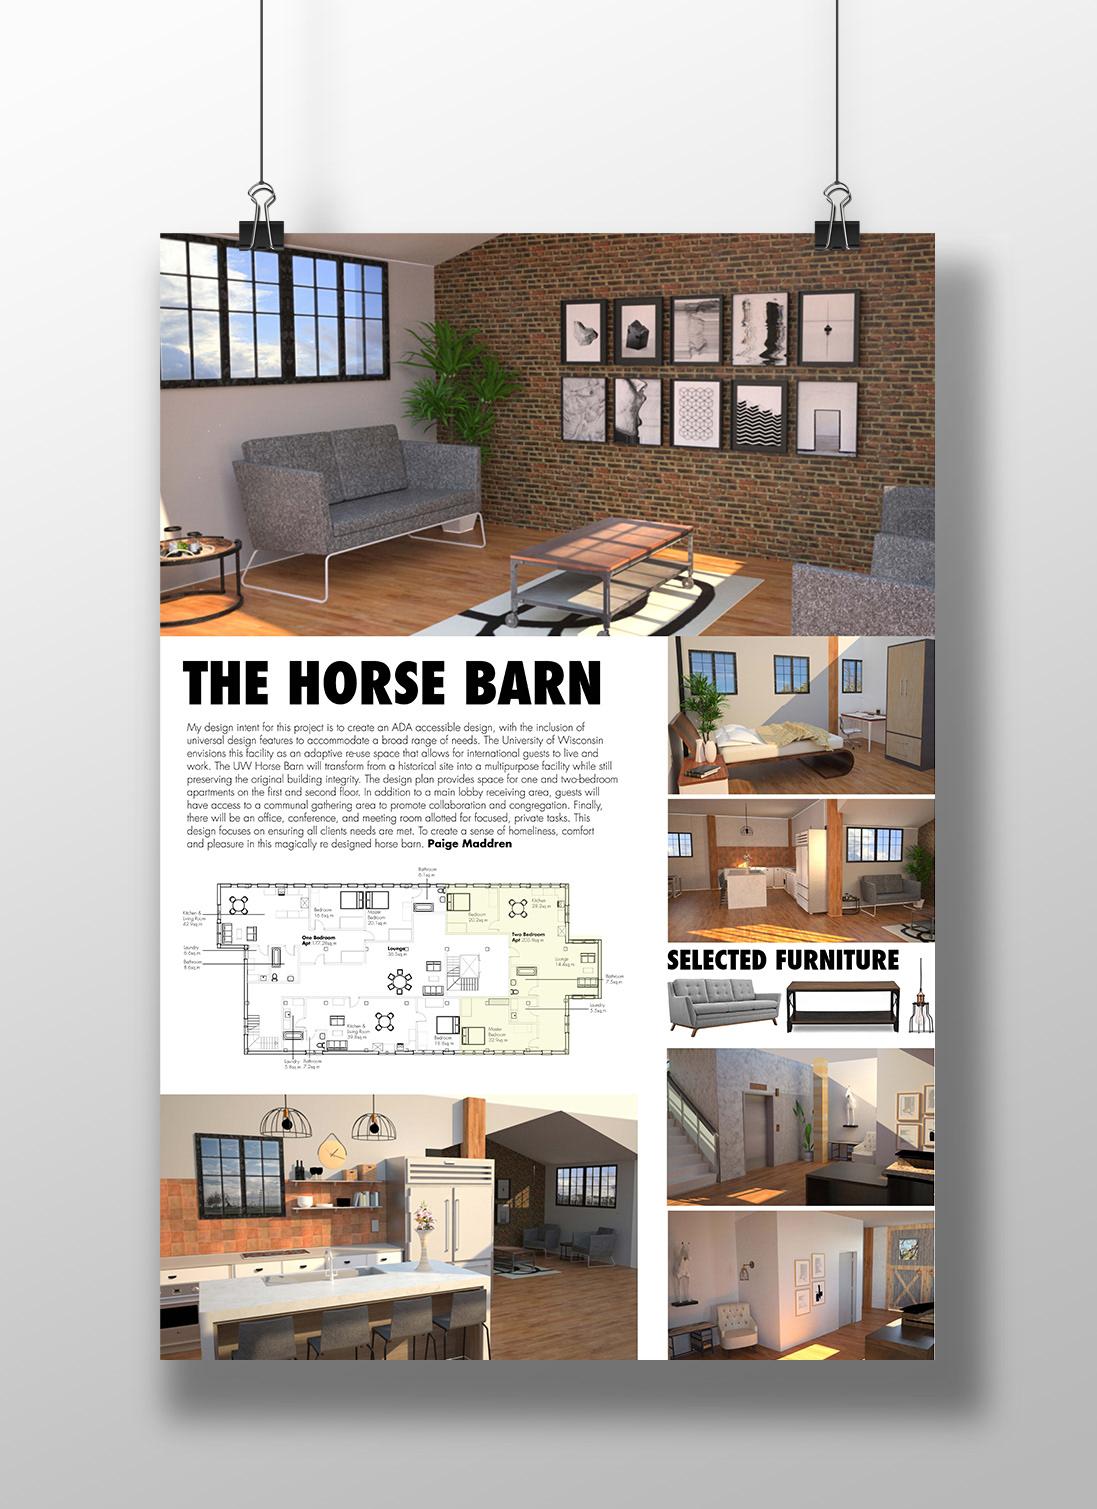 Paige Maddren - UW Horse Barn Apartments